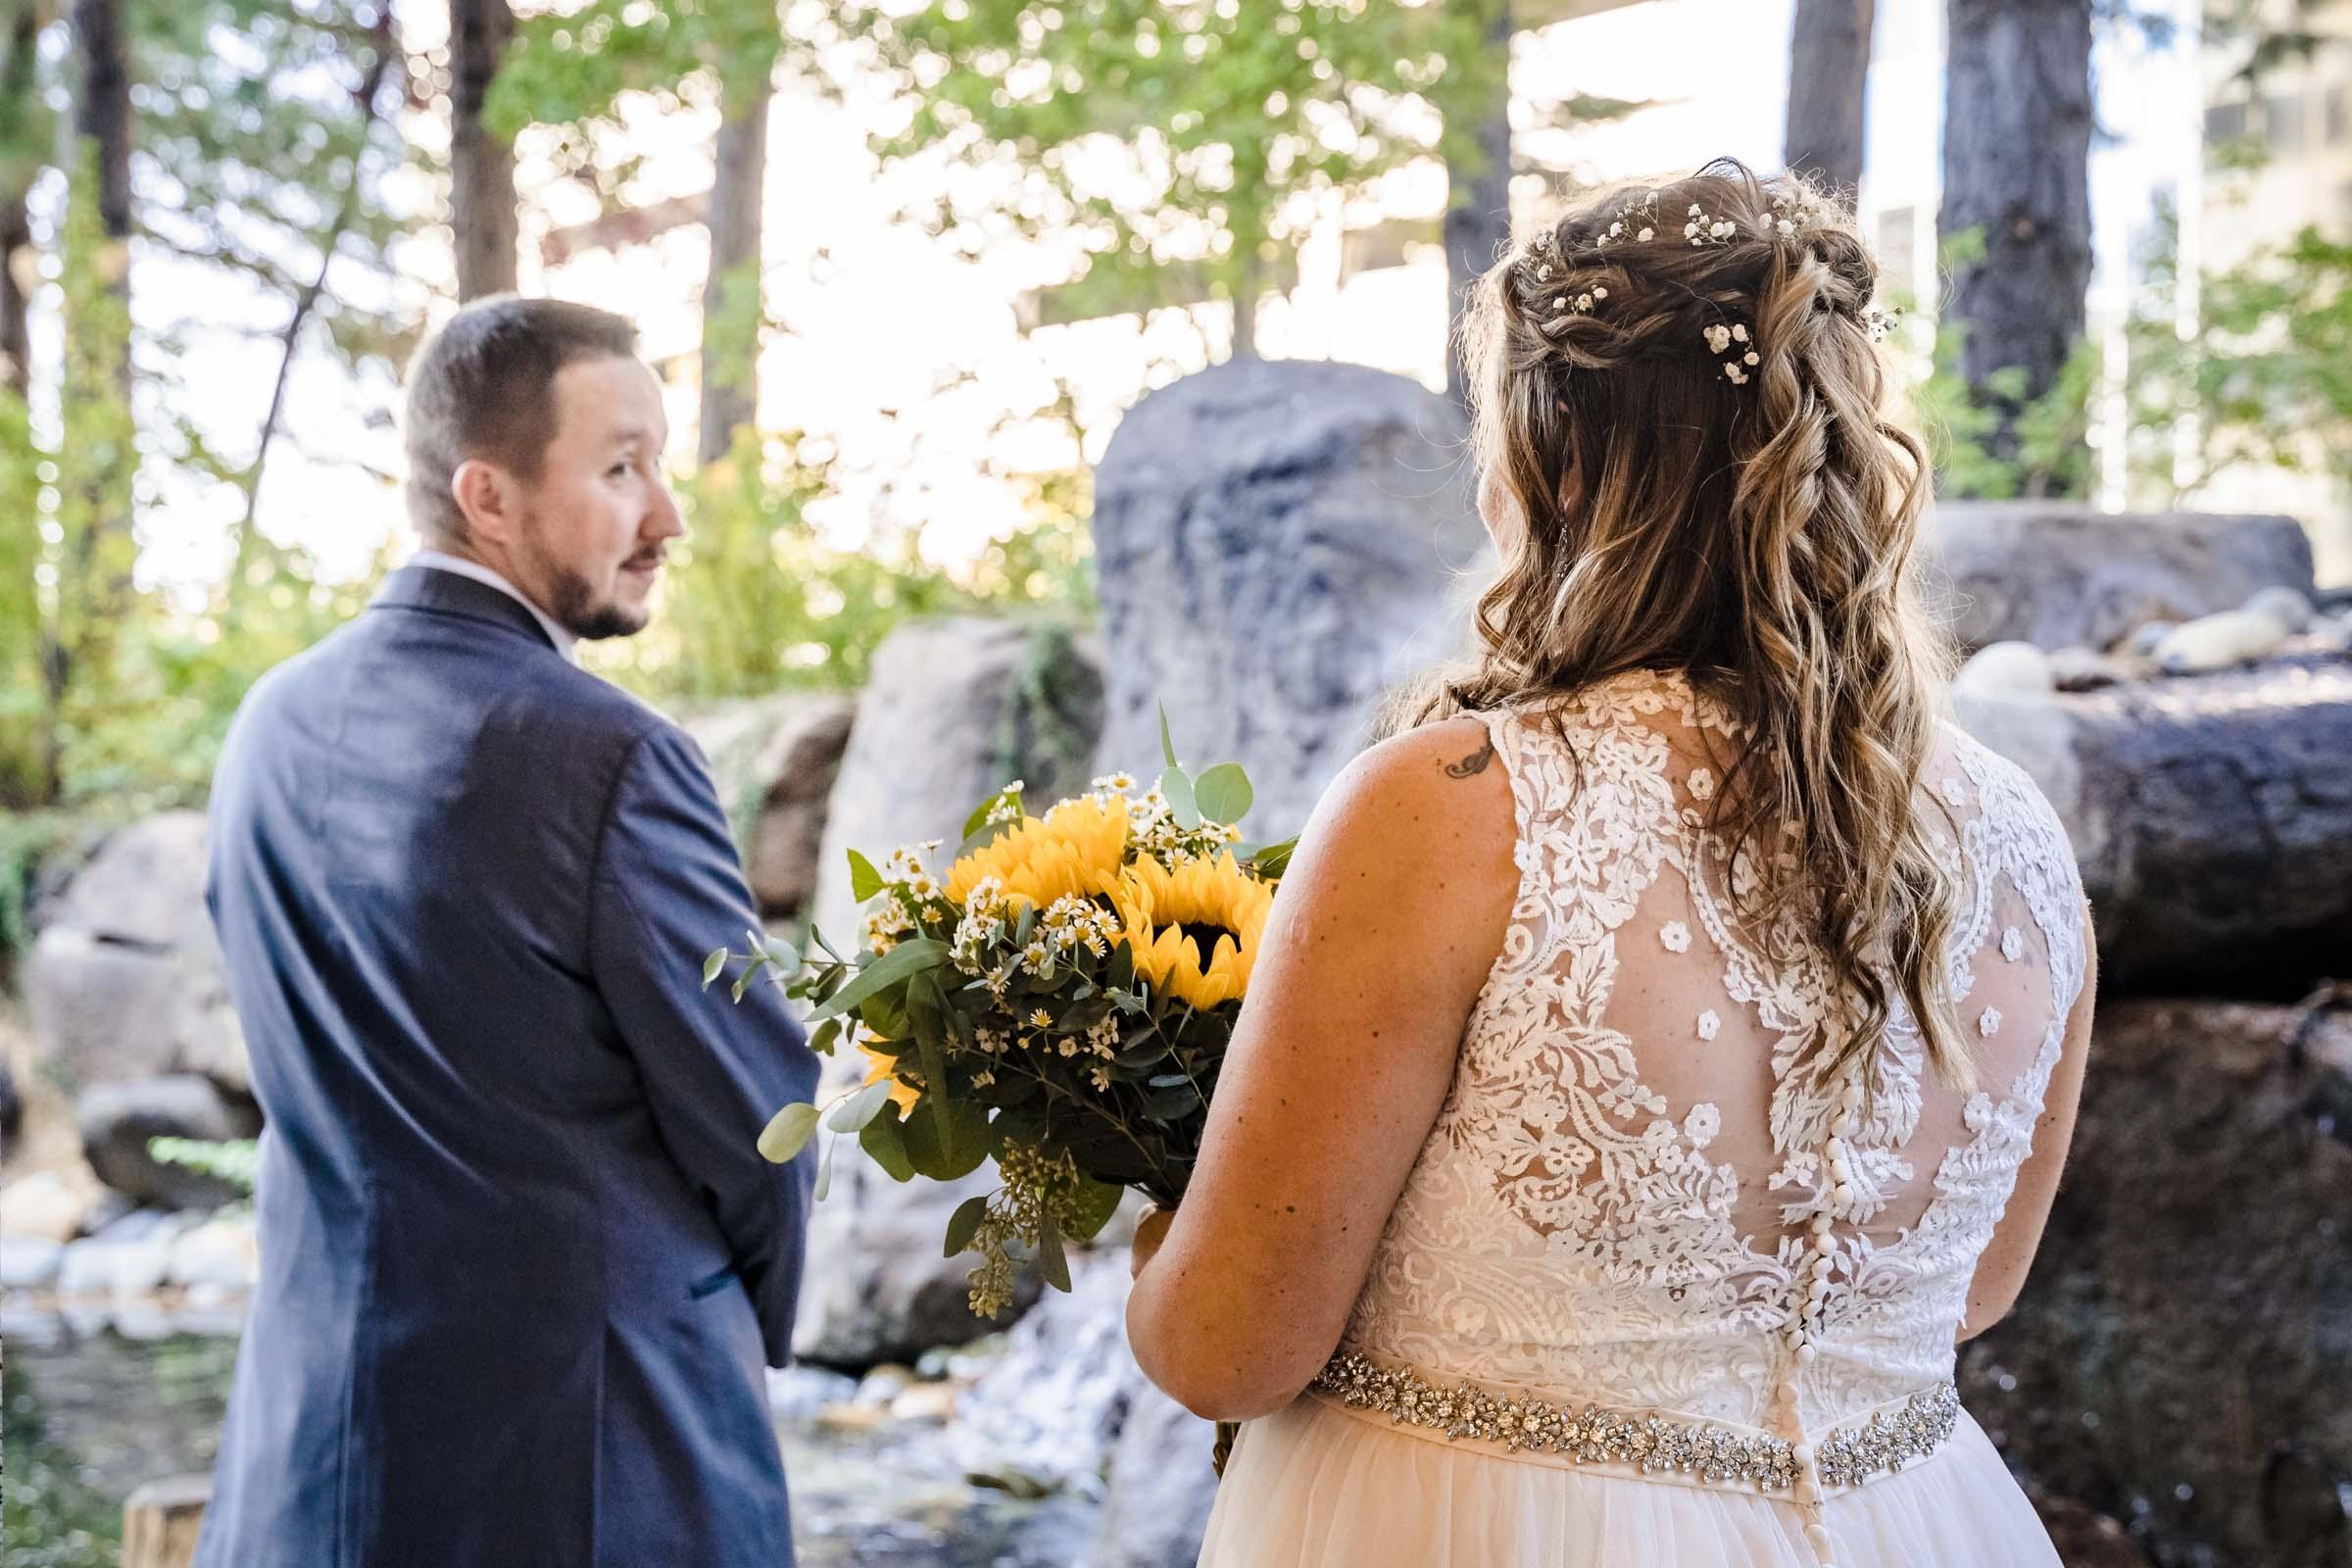 First Look for wedding at Harrahs Harveys South Lake Tahoe